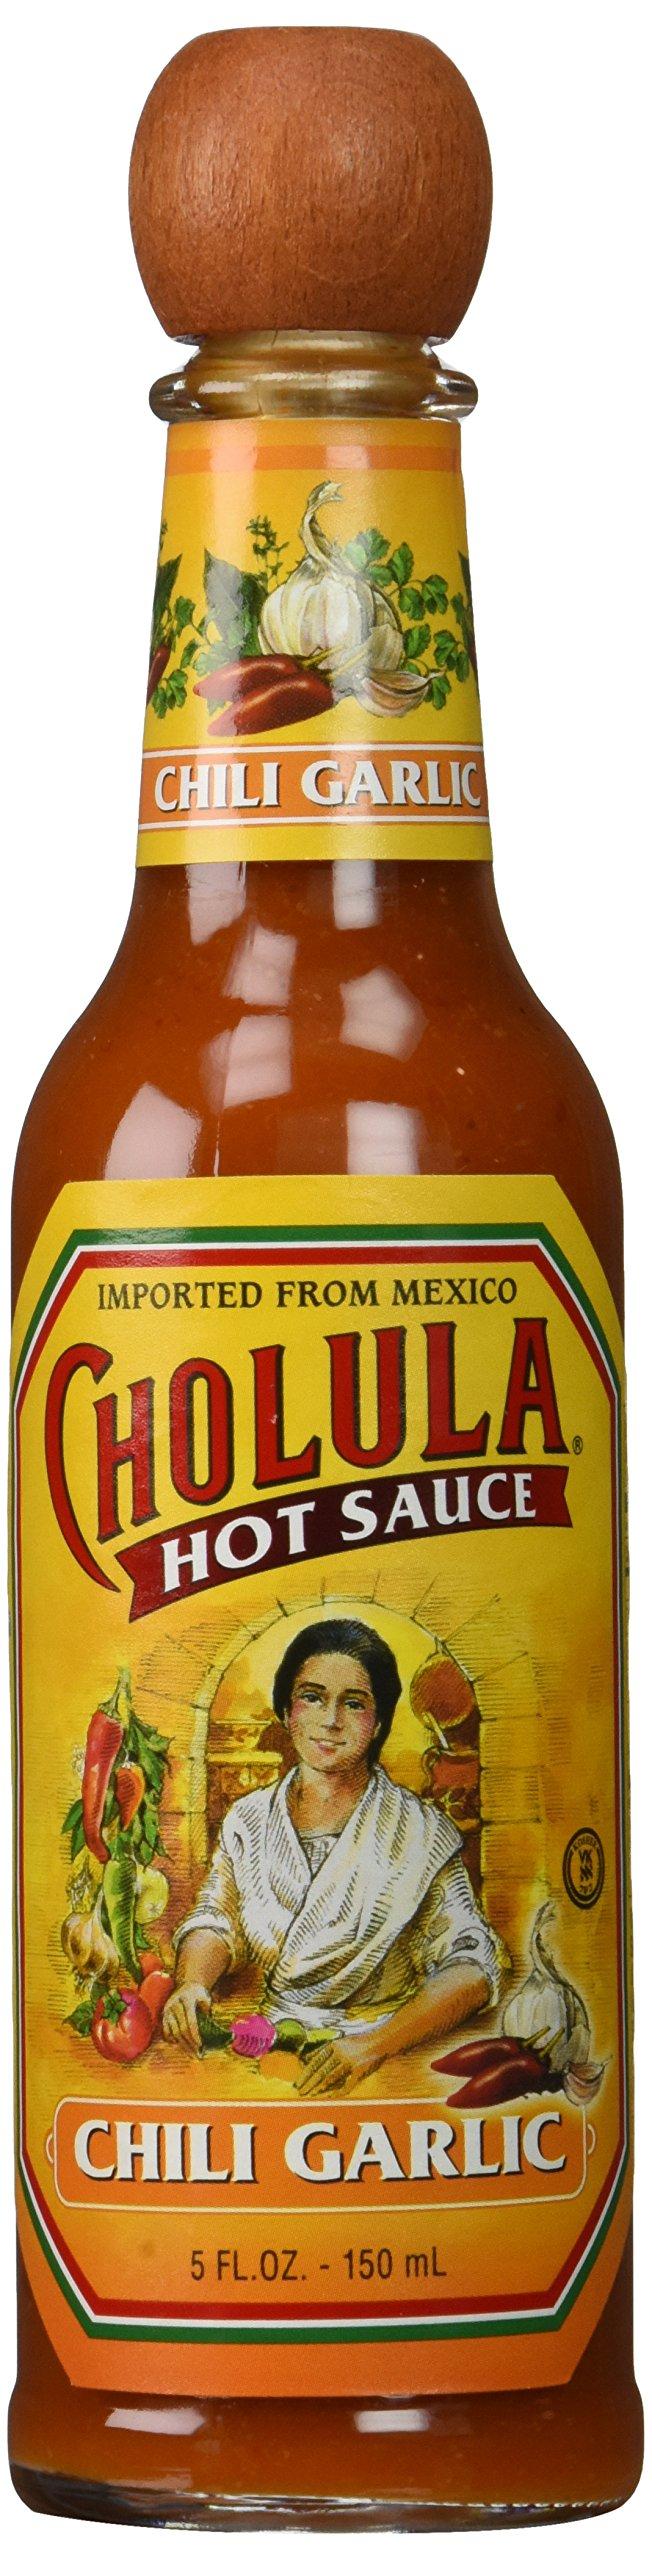 Cholula Chili garlic Hot Sauce, 5 Fl Oz (Pack of 3)